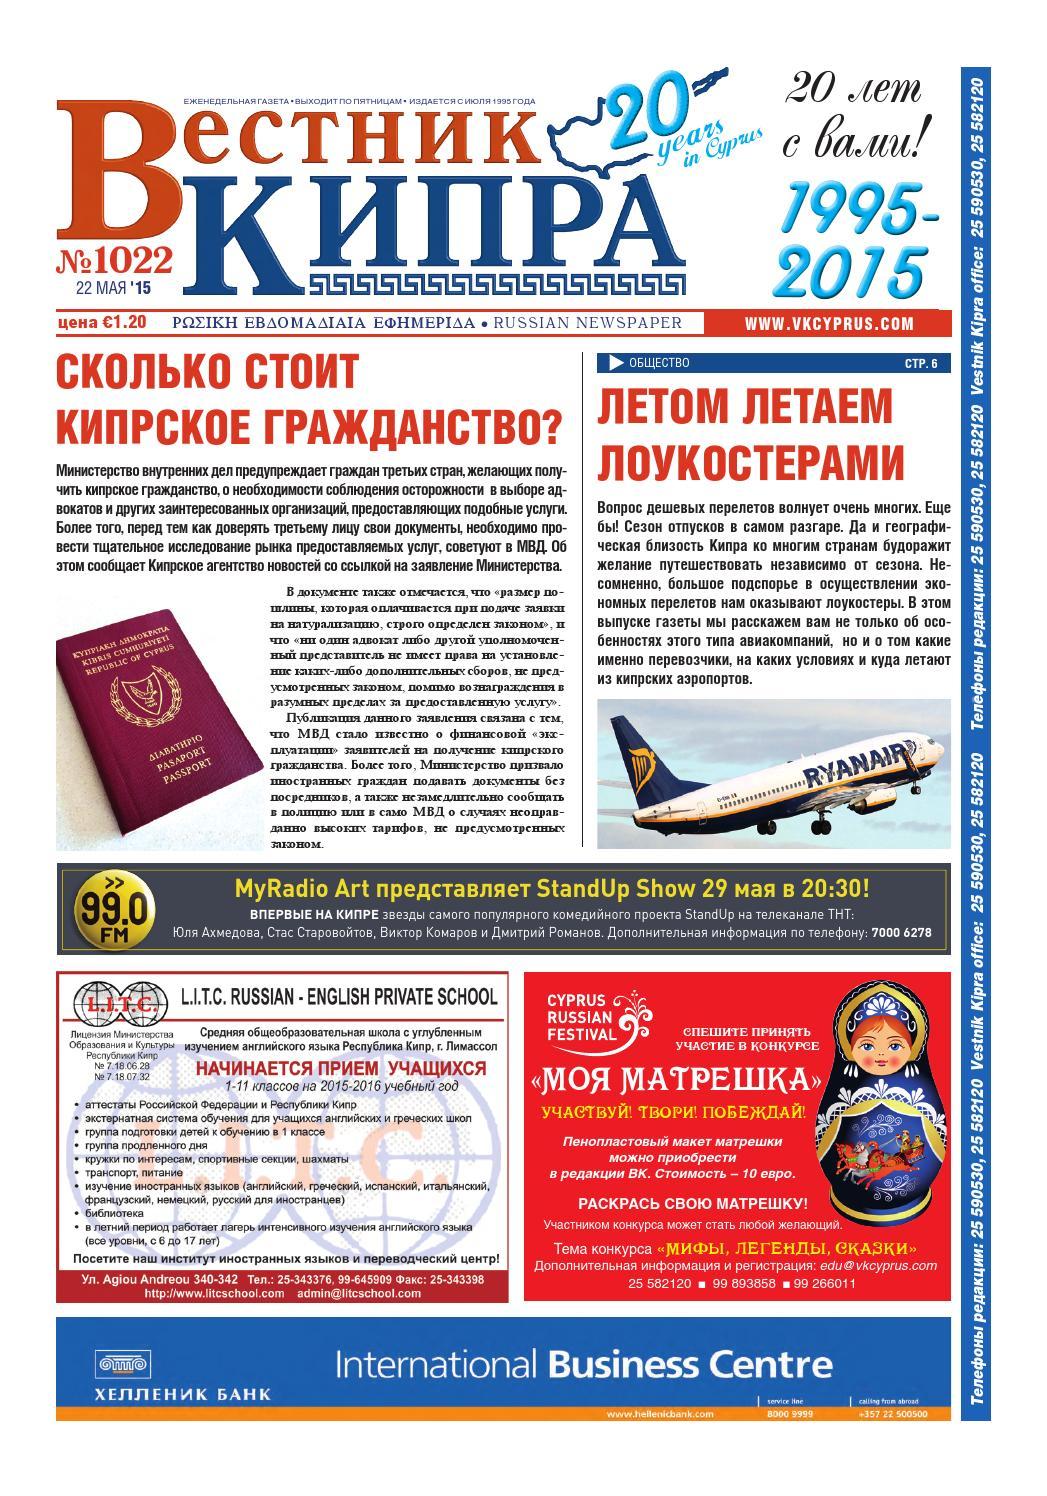 5094c9bdc Вестник Кипра №1022 by Вестник Кипра - issuu